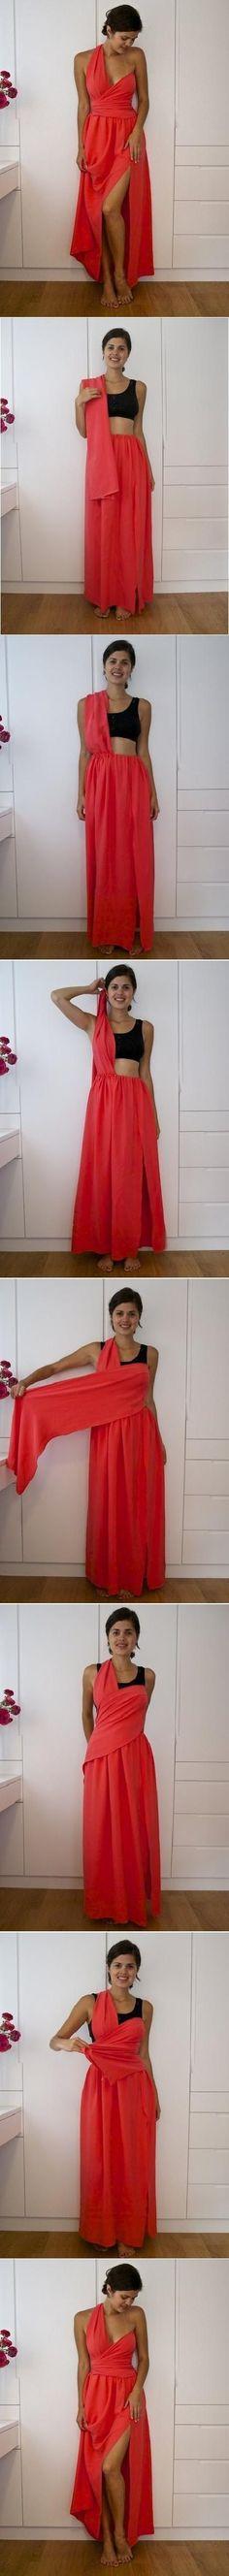 DIY No Sew Dress DIY Projects / UsefulDIY.com